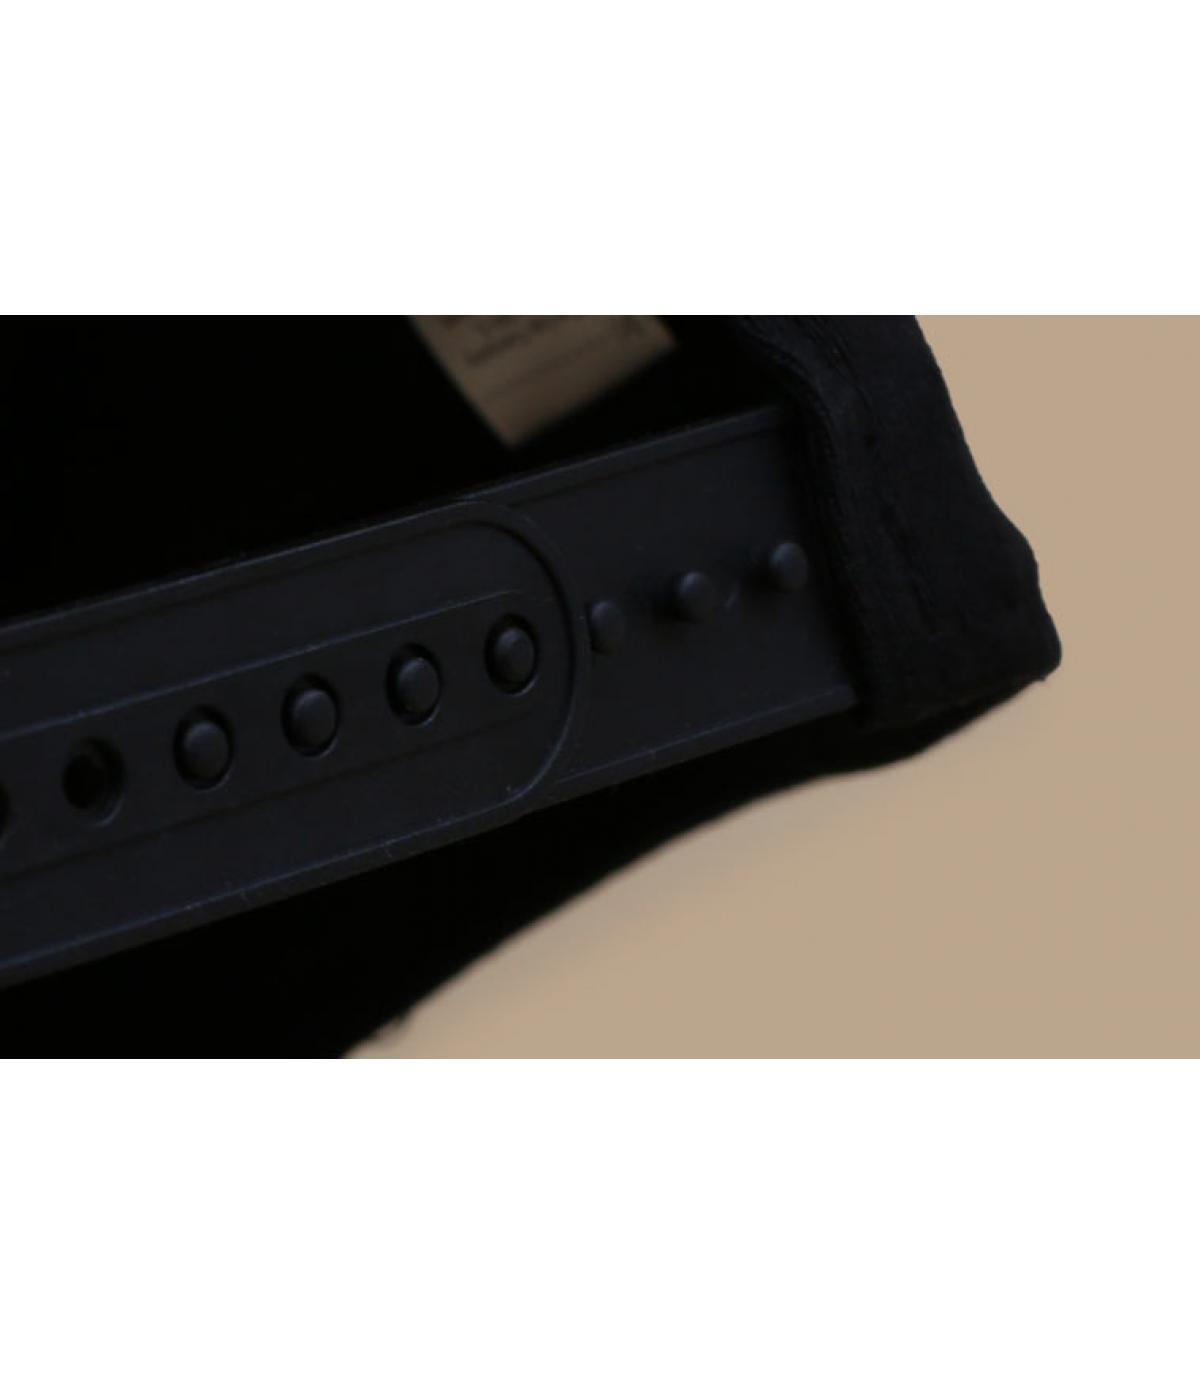 Dettagli Outdoors 950 Stretch black - image 5